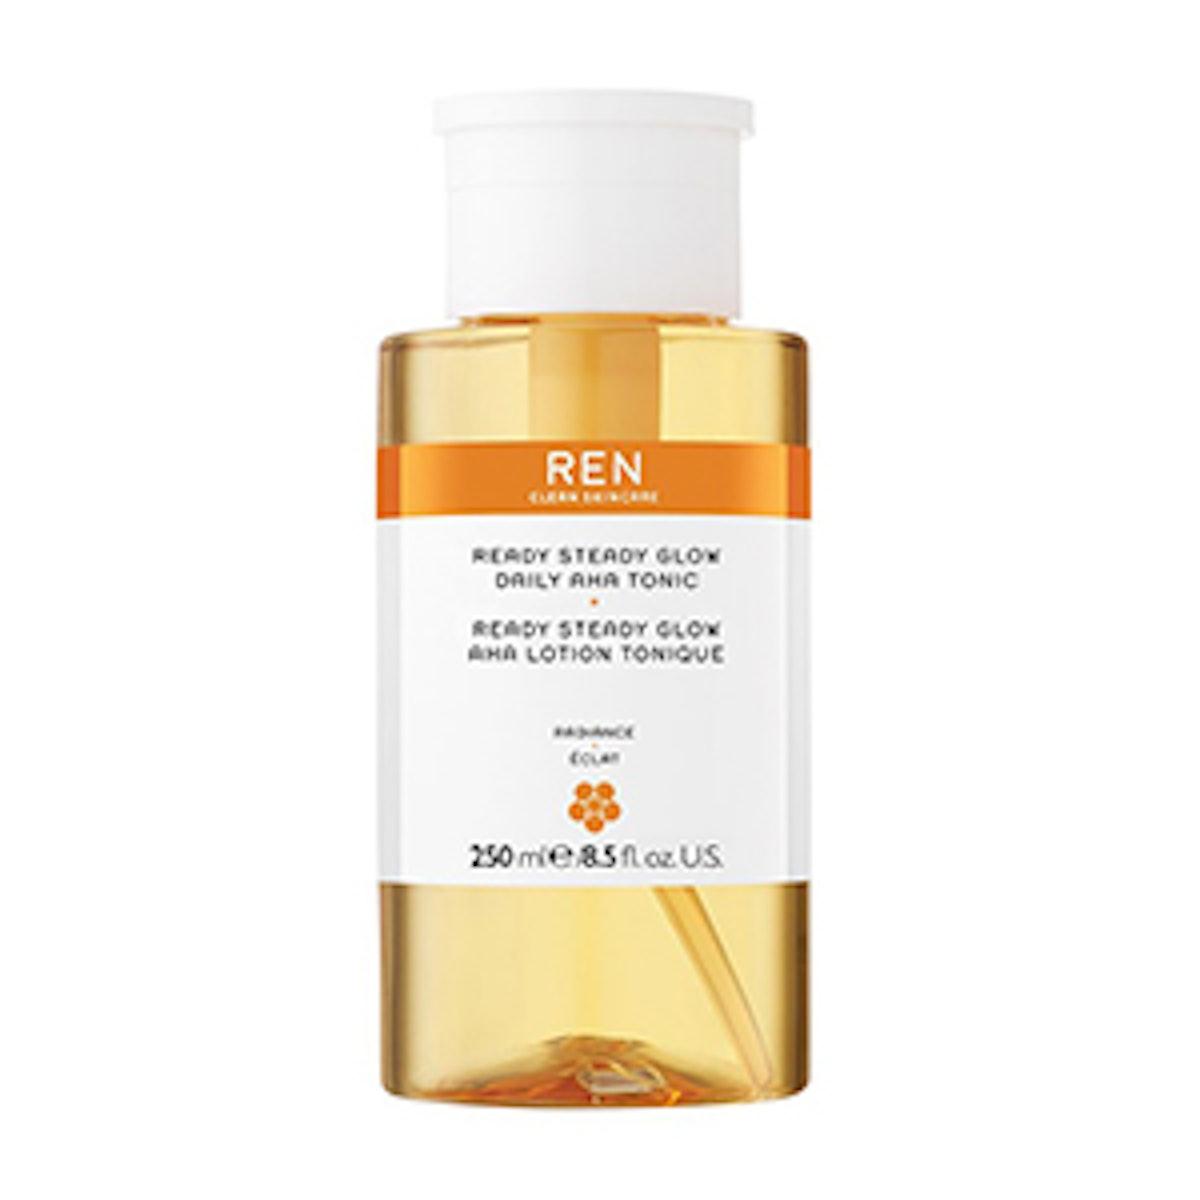 Ren Clean Skincare Ready Steady Glow AHA Tonic